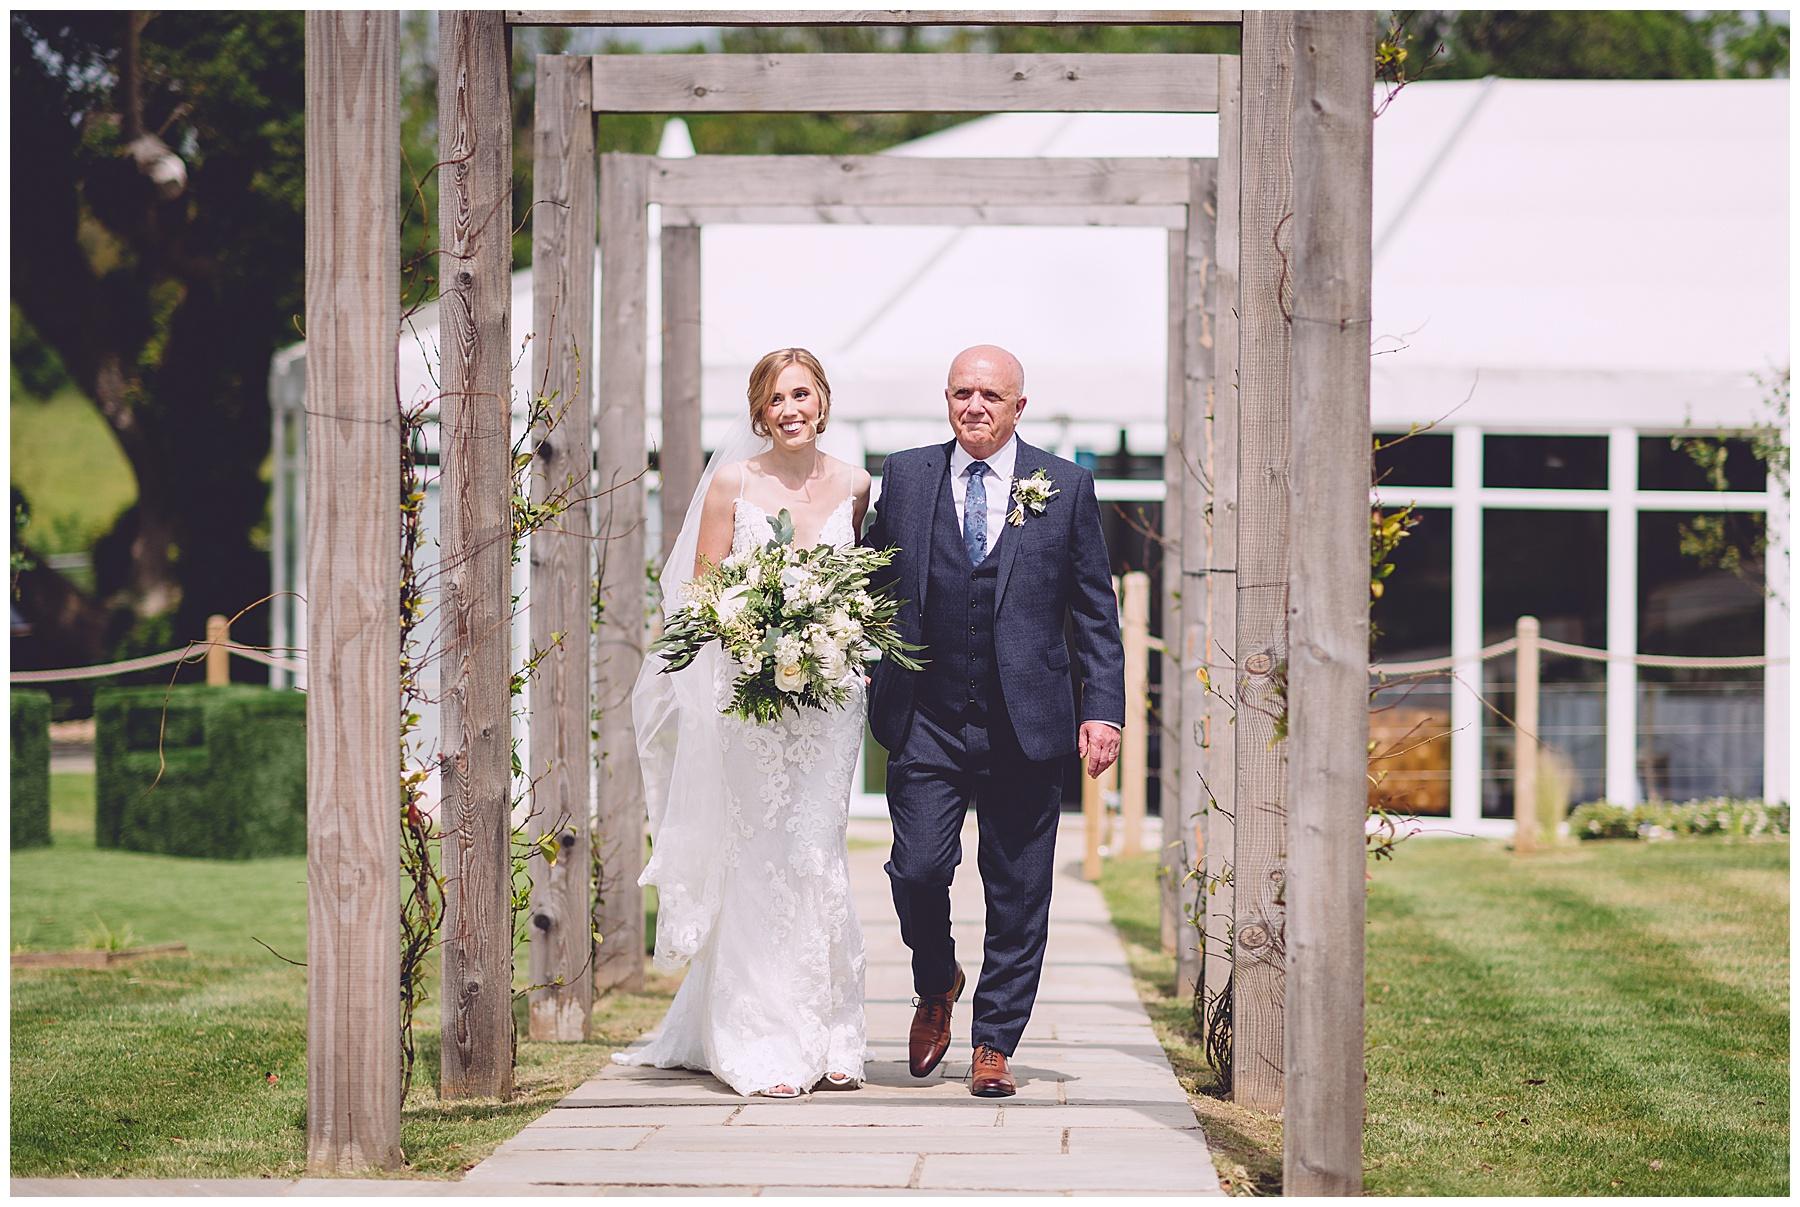 Outdoor Wedding at Oldwalls